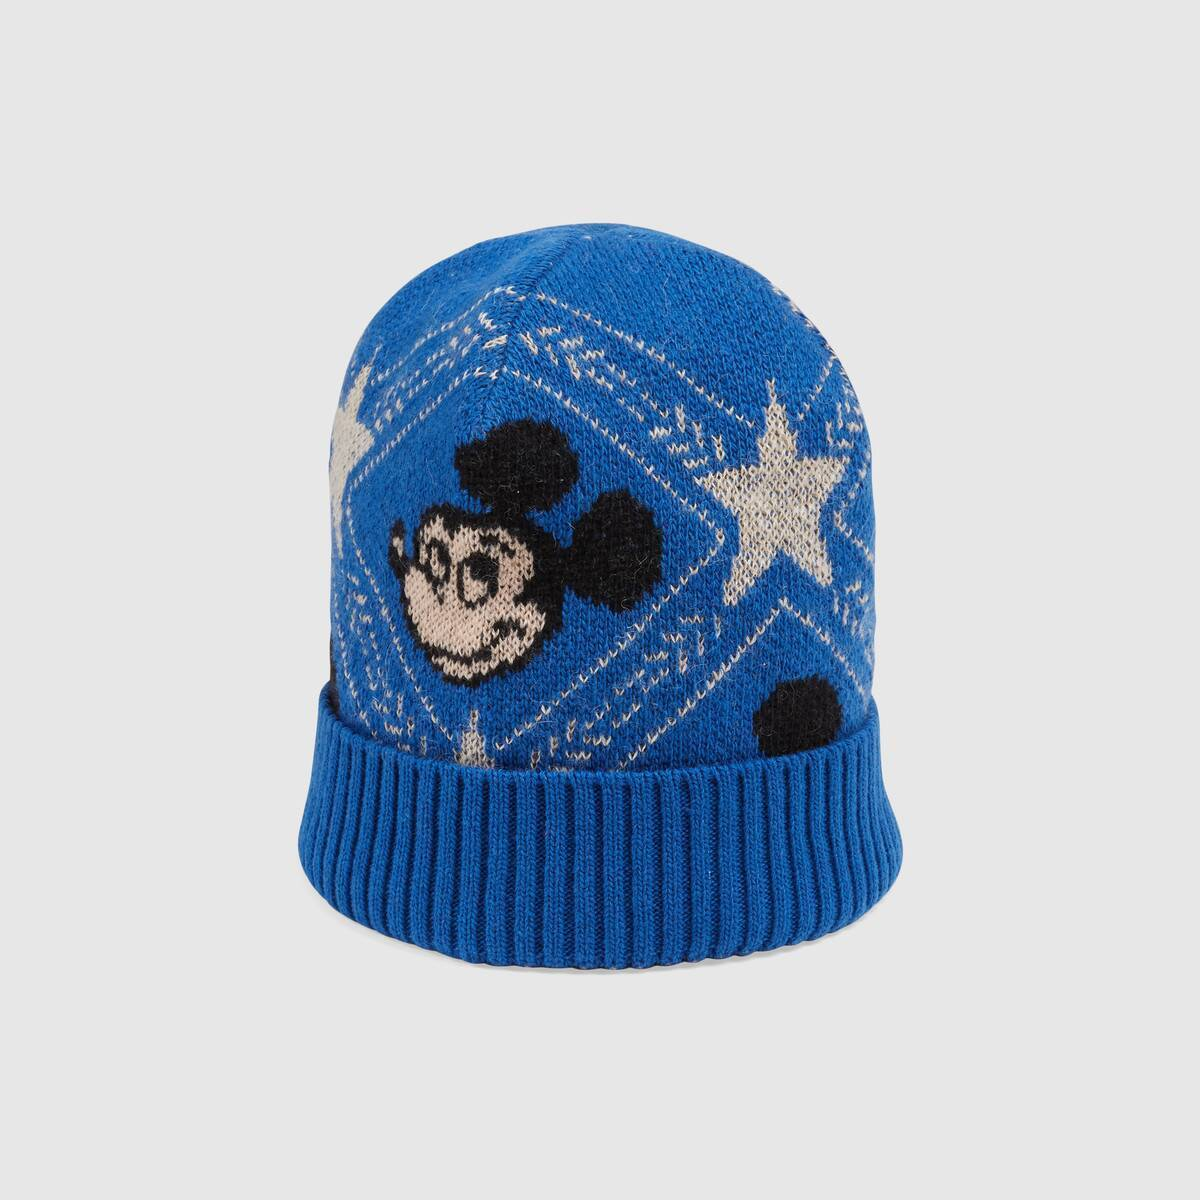 GUCCI Gucci x Disney Jacquard-knit Beanie Hat in Blue